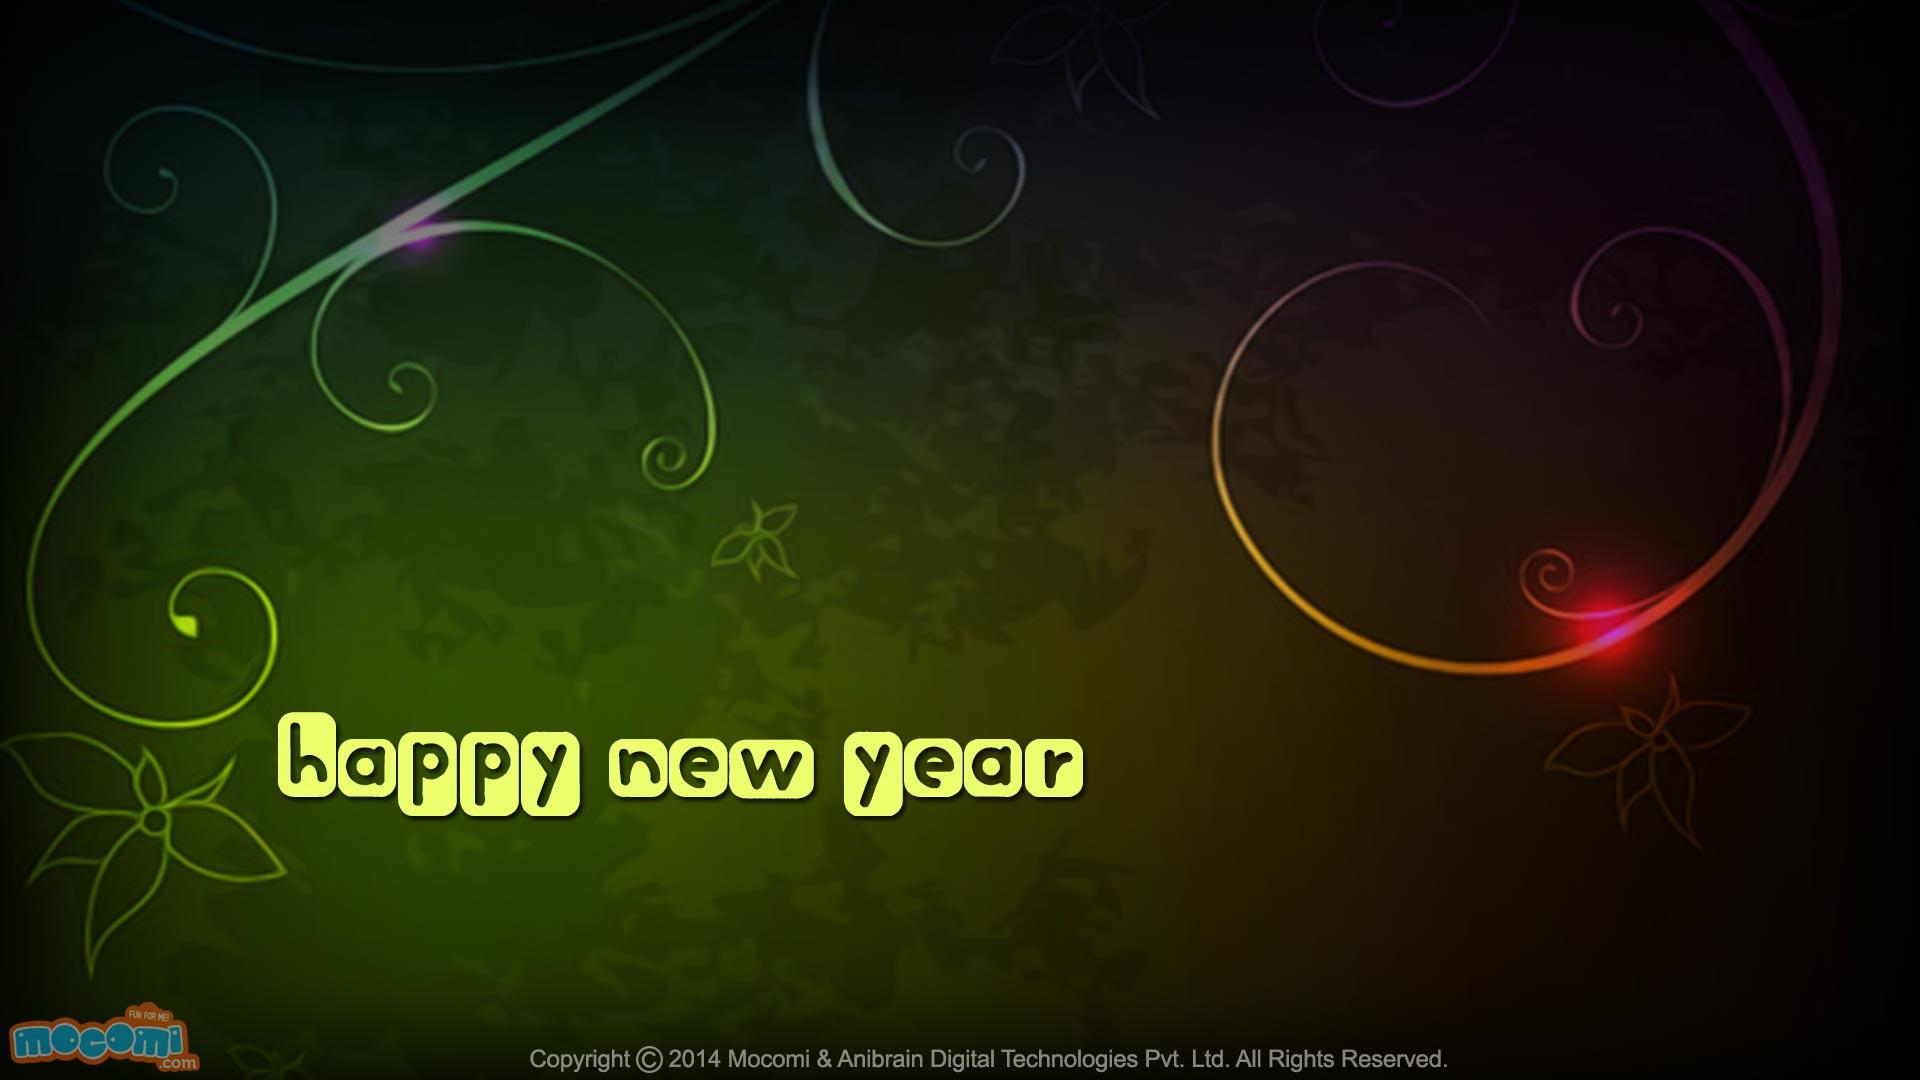 Happy New Year Wallpaper- 6